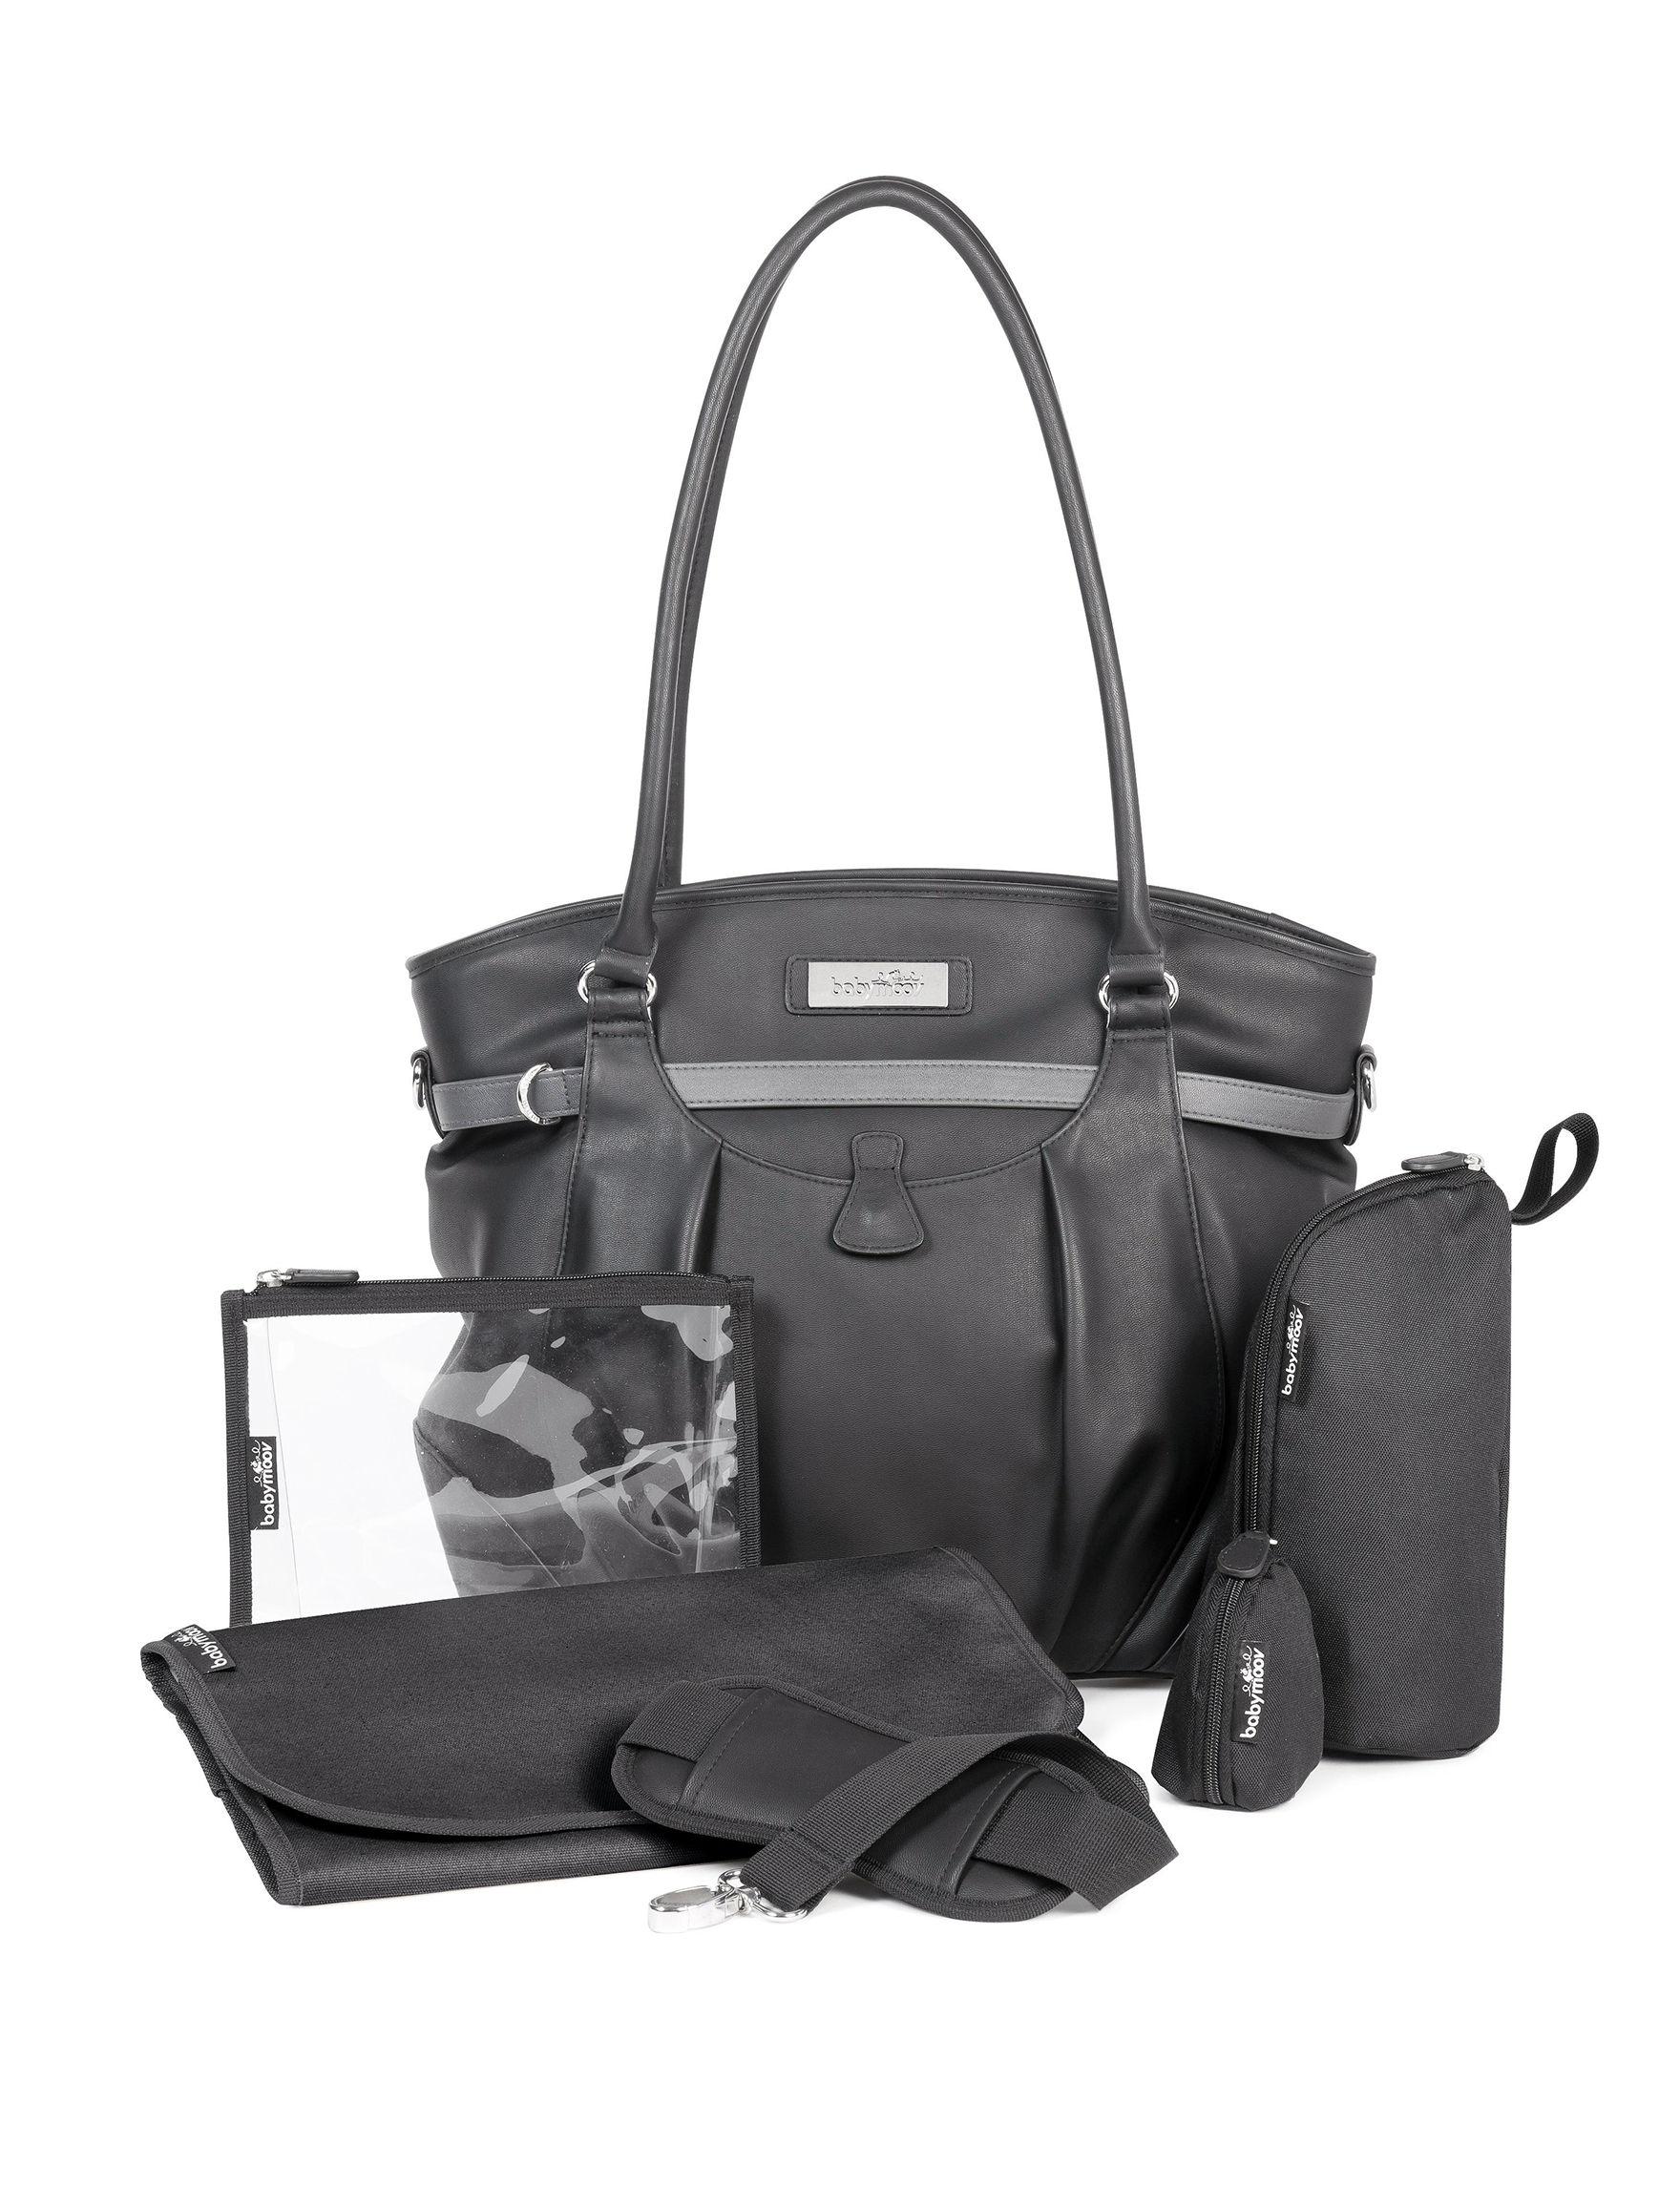 Babymoov Black Diaper Bags